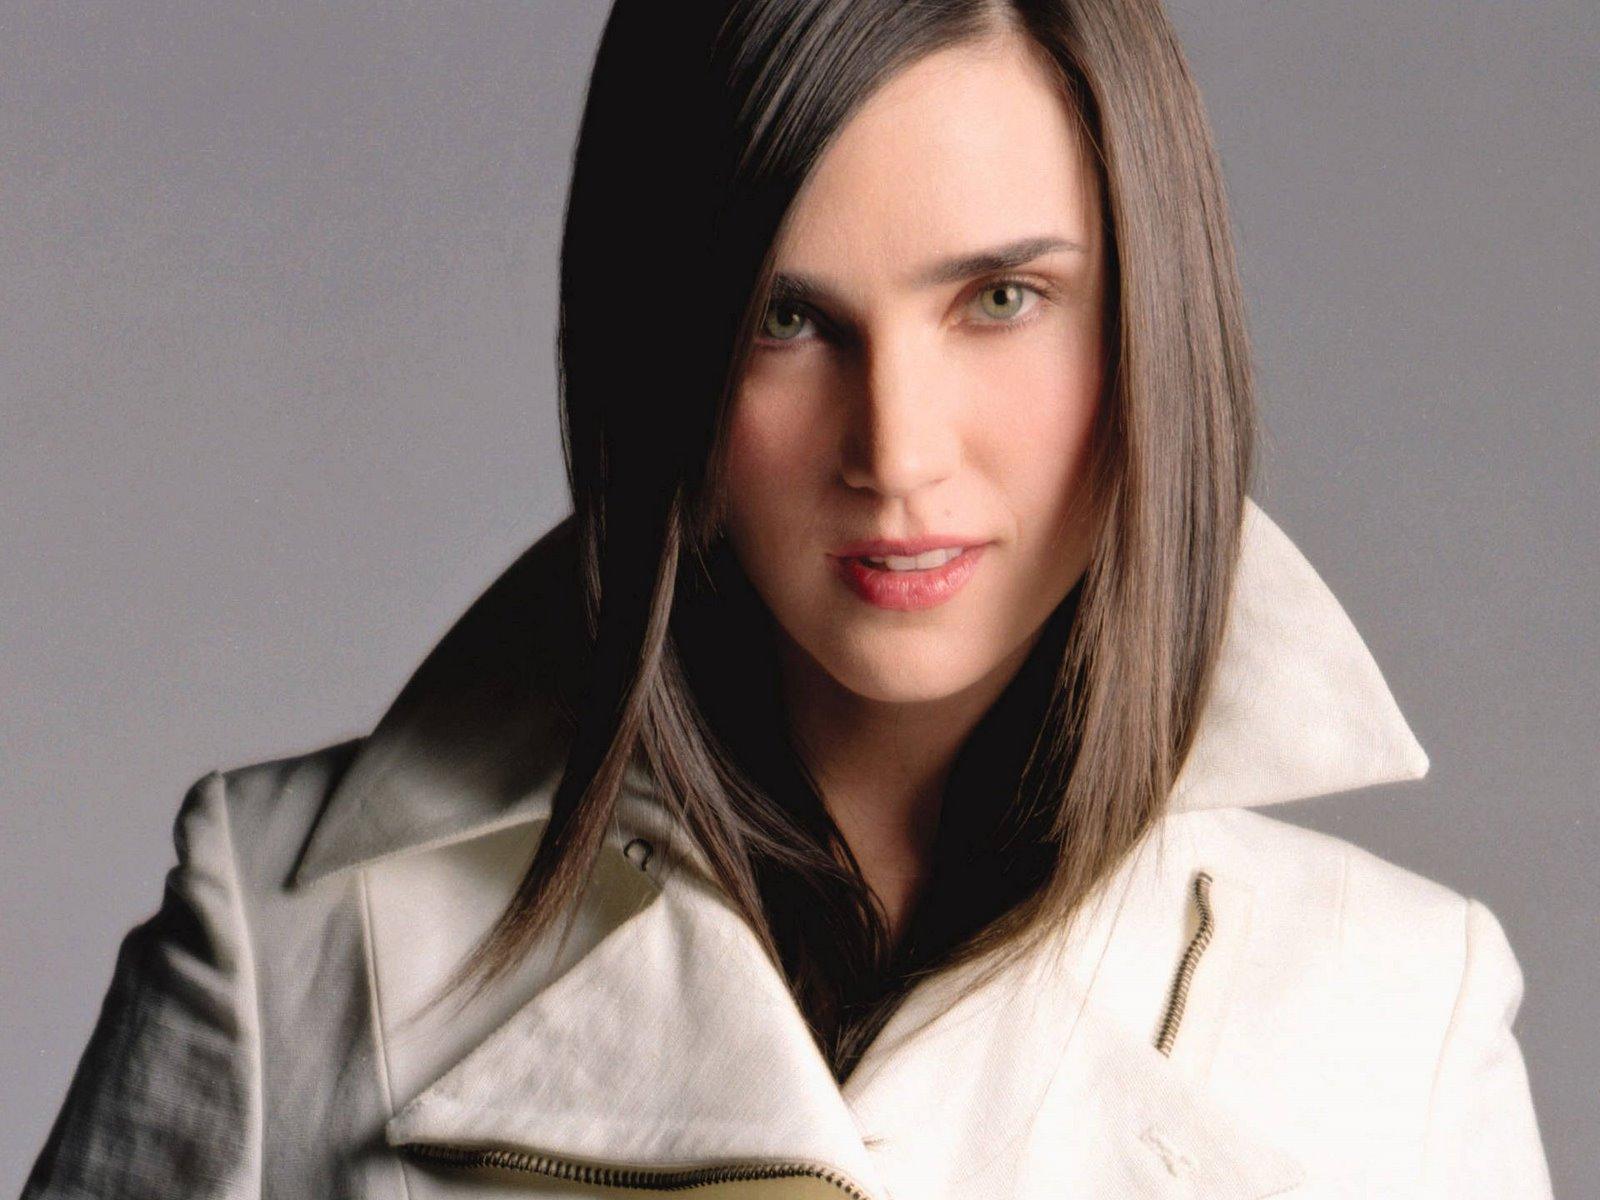 http://1.bp.blogspot.com/-rjr3soq5cXM/UER4xi8tiyI/AAAAAAAAED0/ytxYP4BT46Y/s1600/Jennifer-Connelly-Medium-Hairstyle.jpg